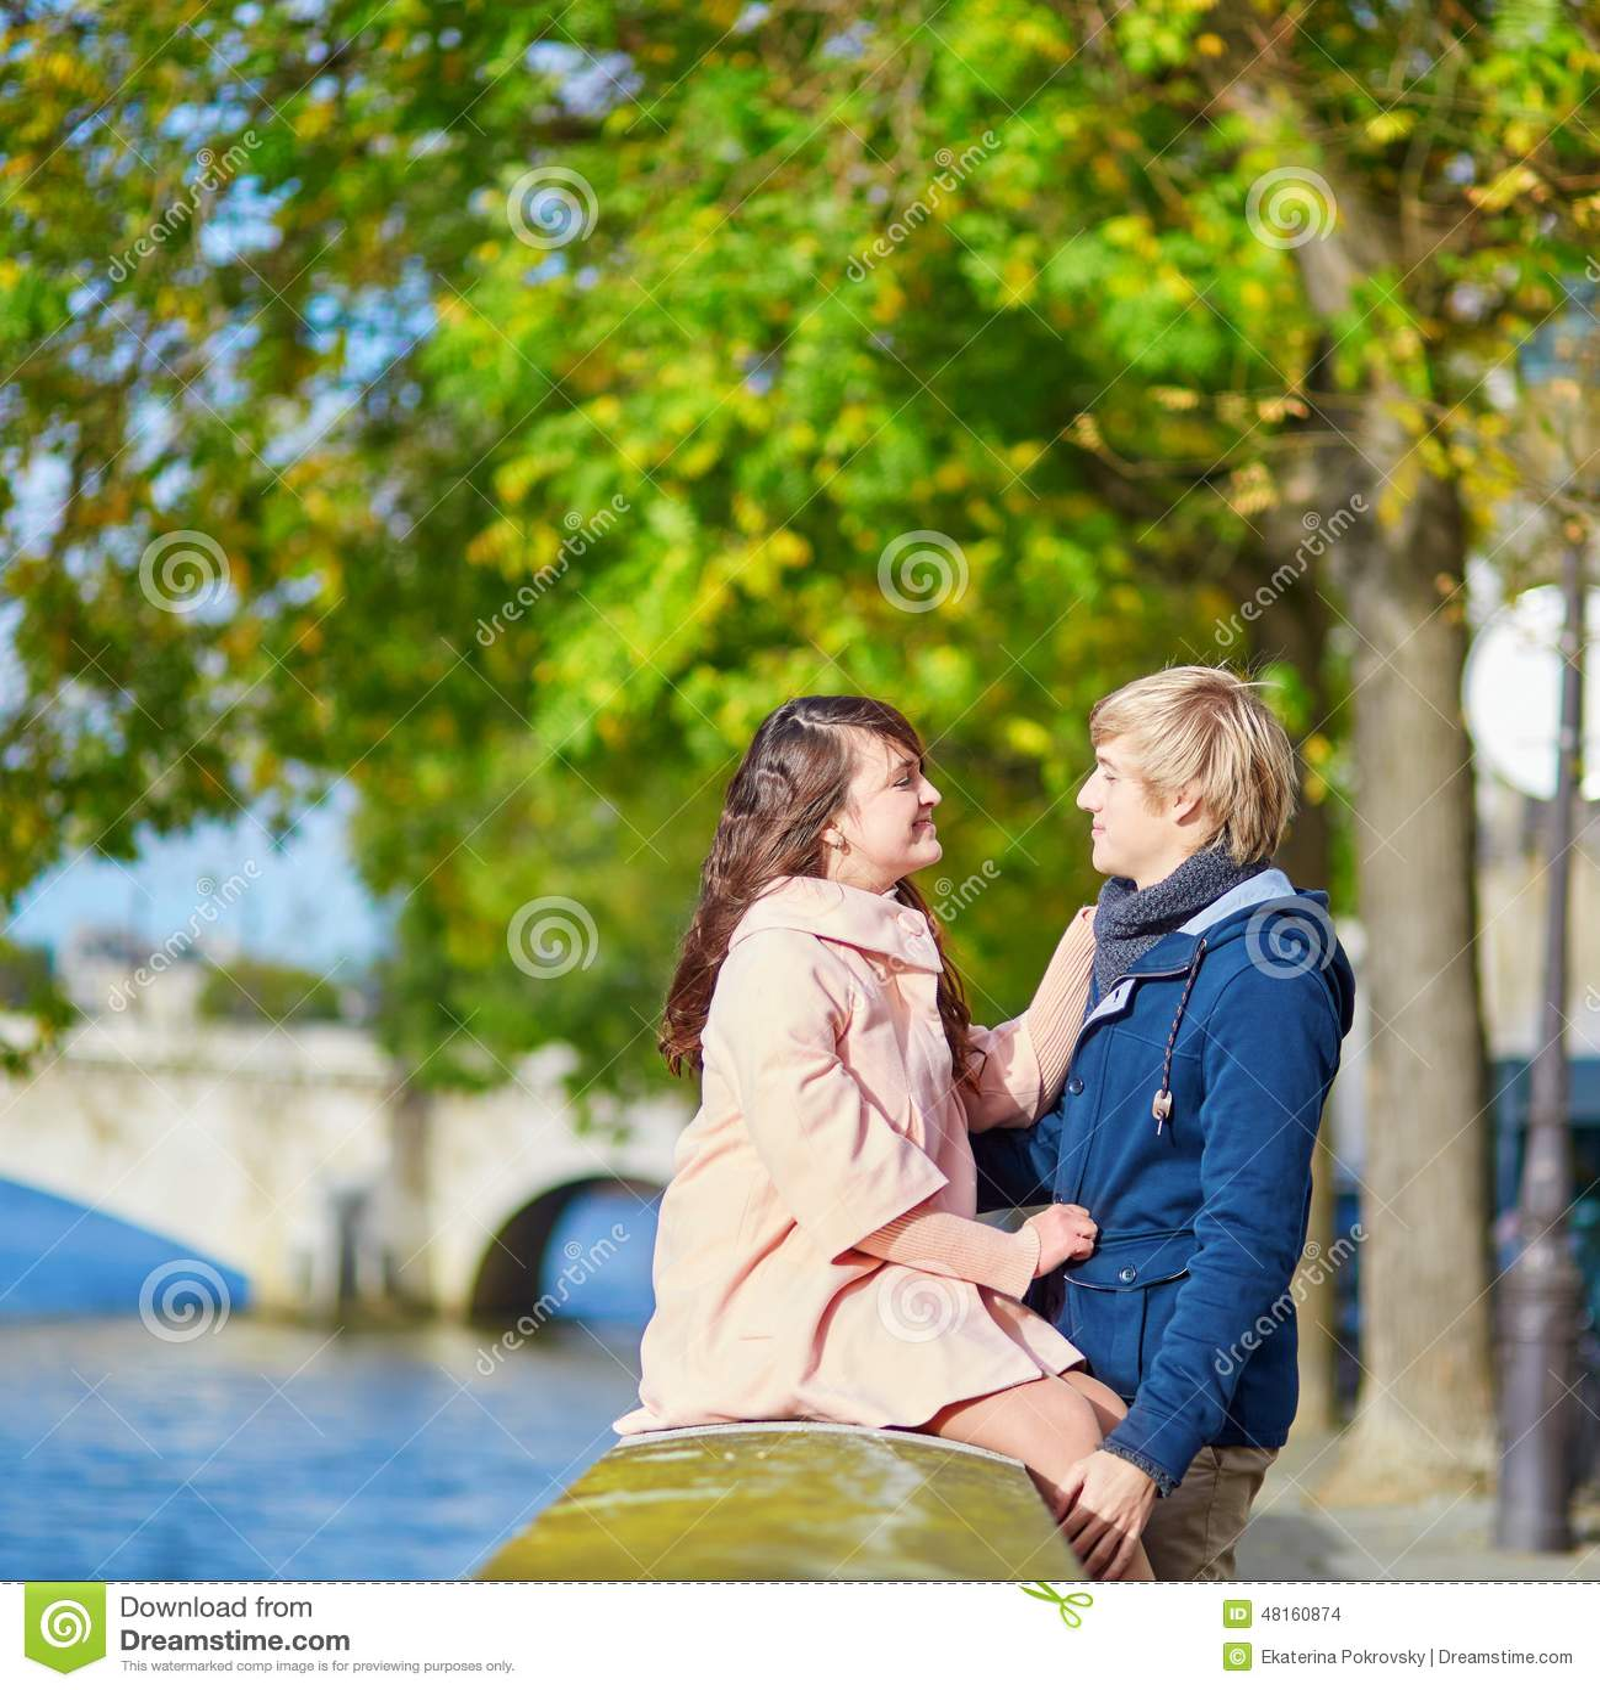 dating-in-paris-free